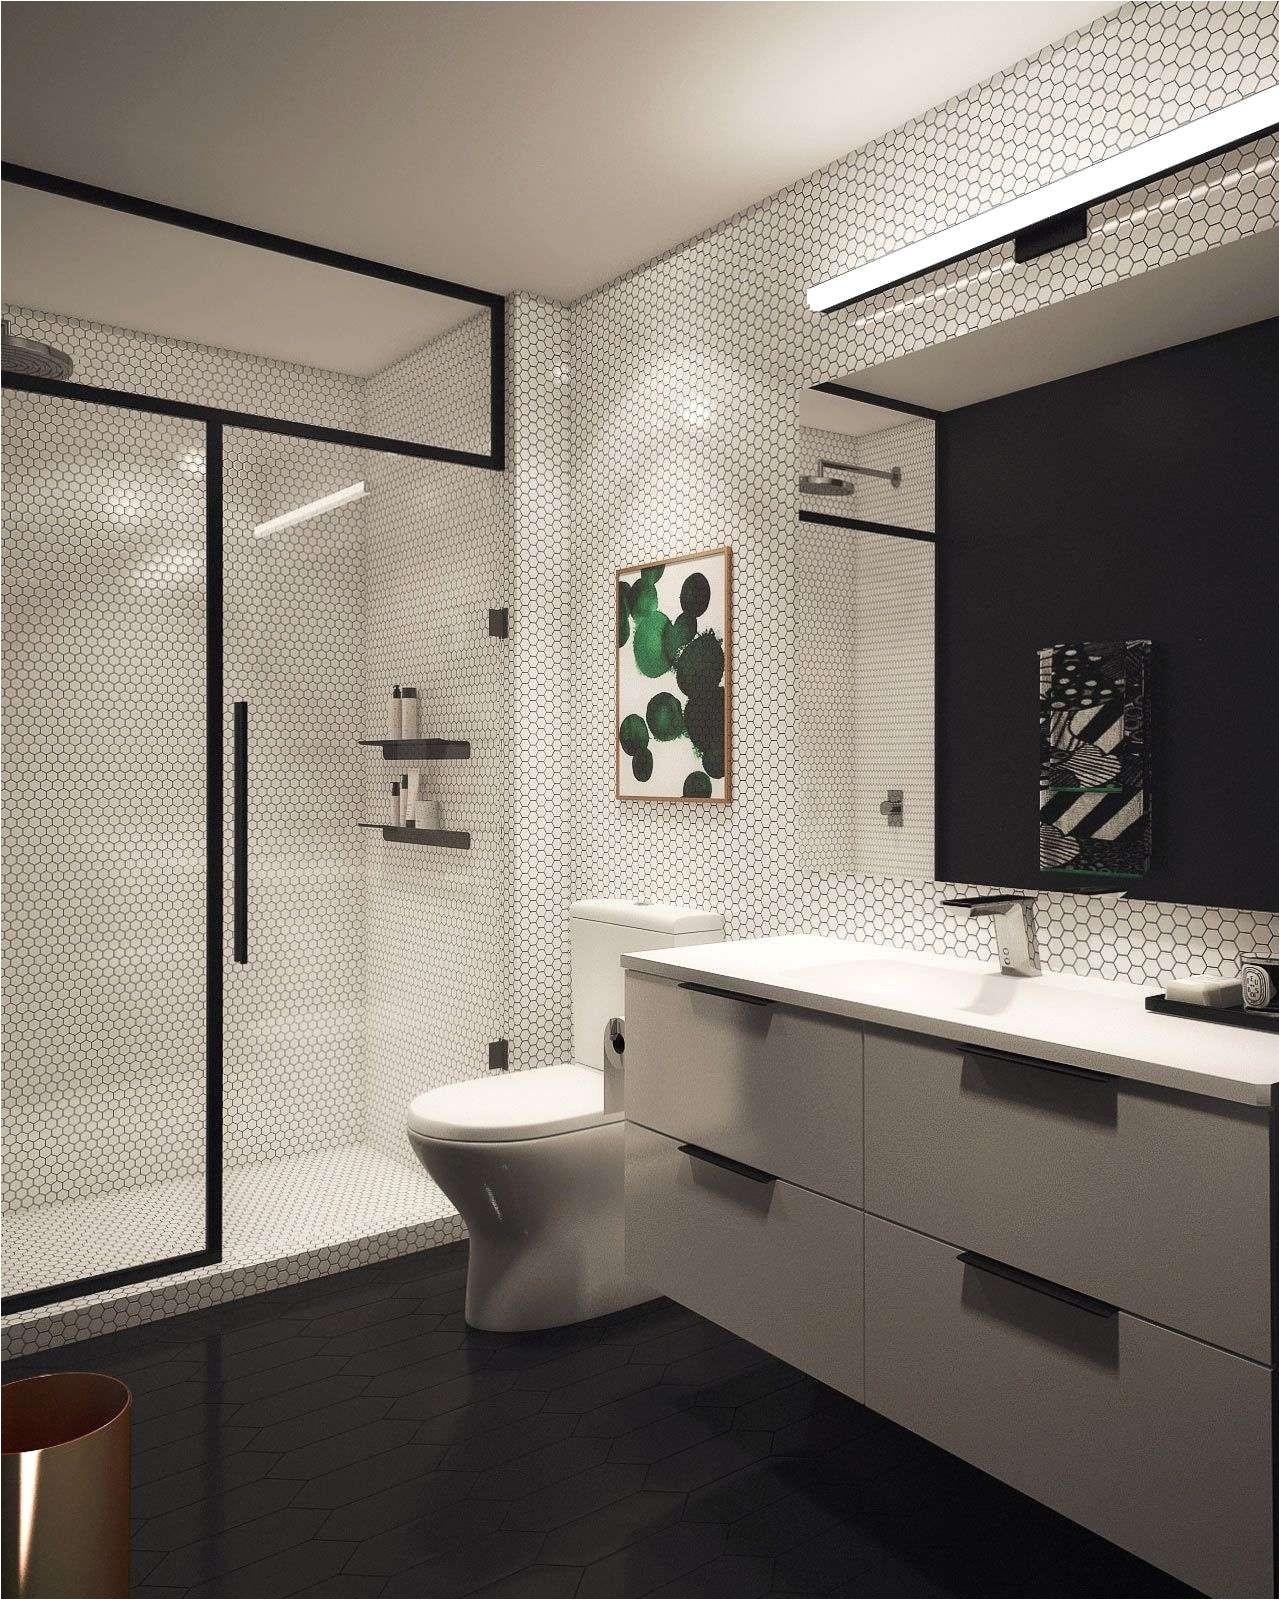 Magnificent Bathroom Wall Tile Ideas For Small Bathrooms Lovely Small Bathroom Lighting Fresh Tag Toilet Ideas 0d Best Design